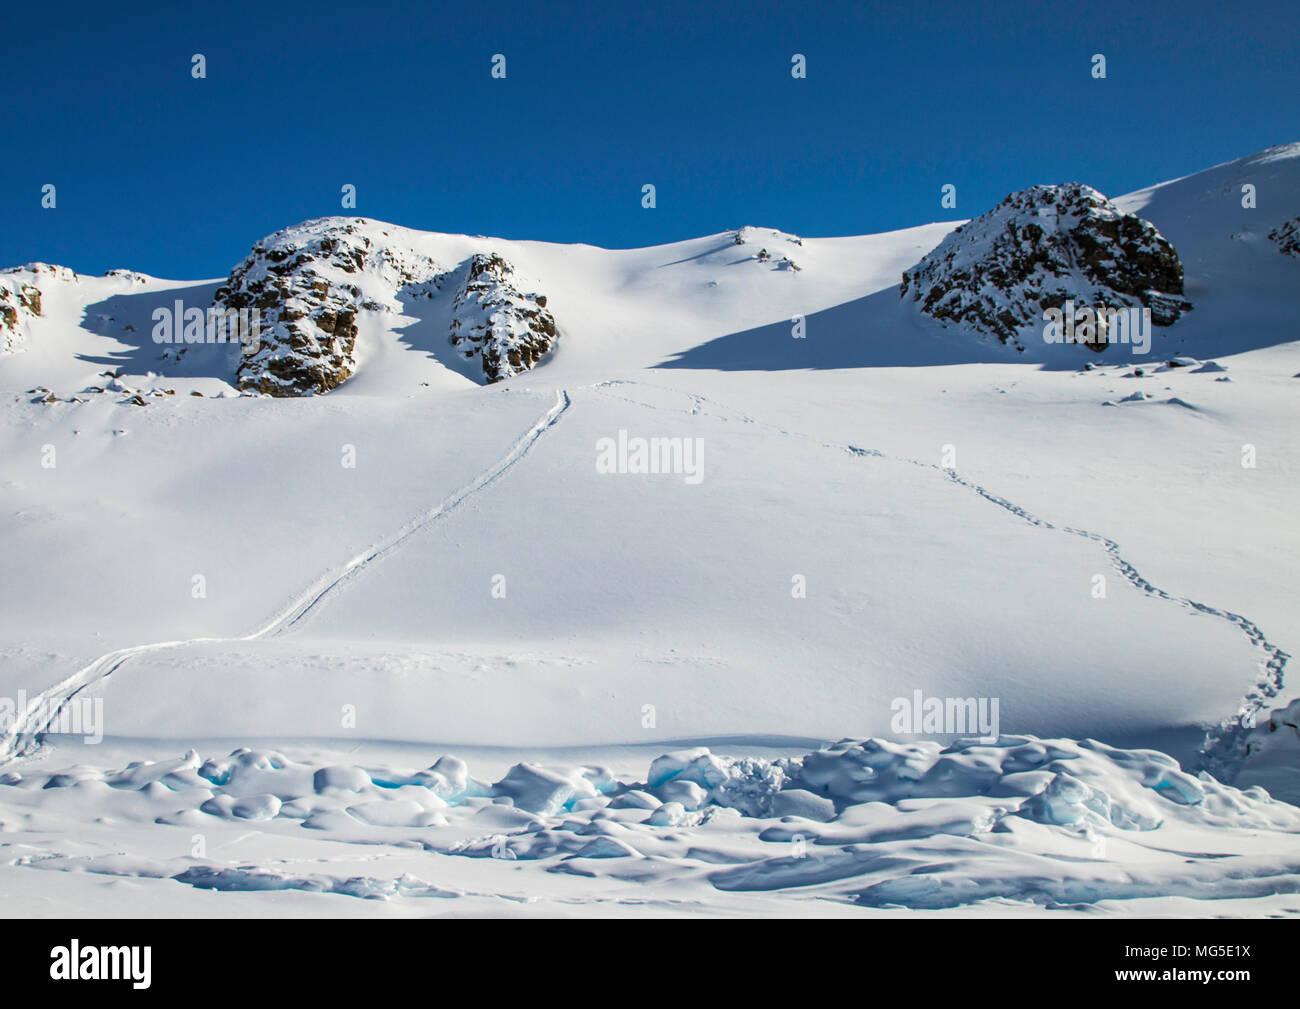 Polar bear tracks and slide marks in the snow on the hillside.  Baffin Island, Nunavut, Canada, arctic - Stock Image